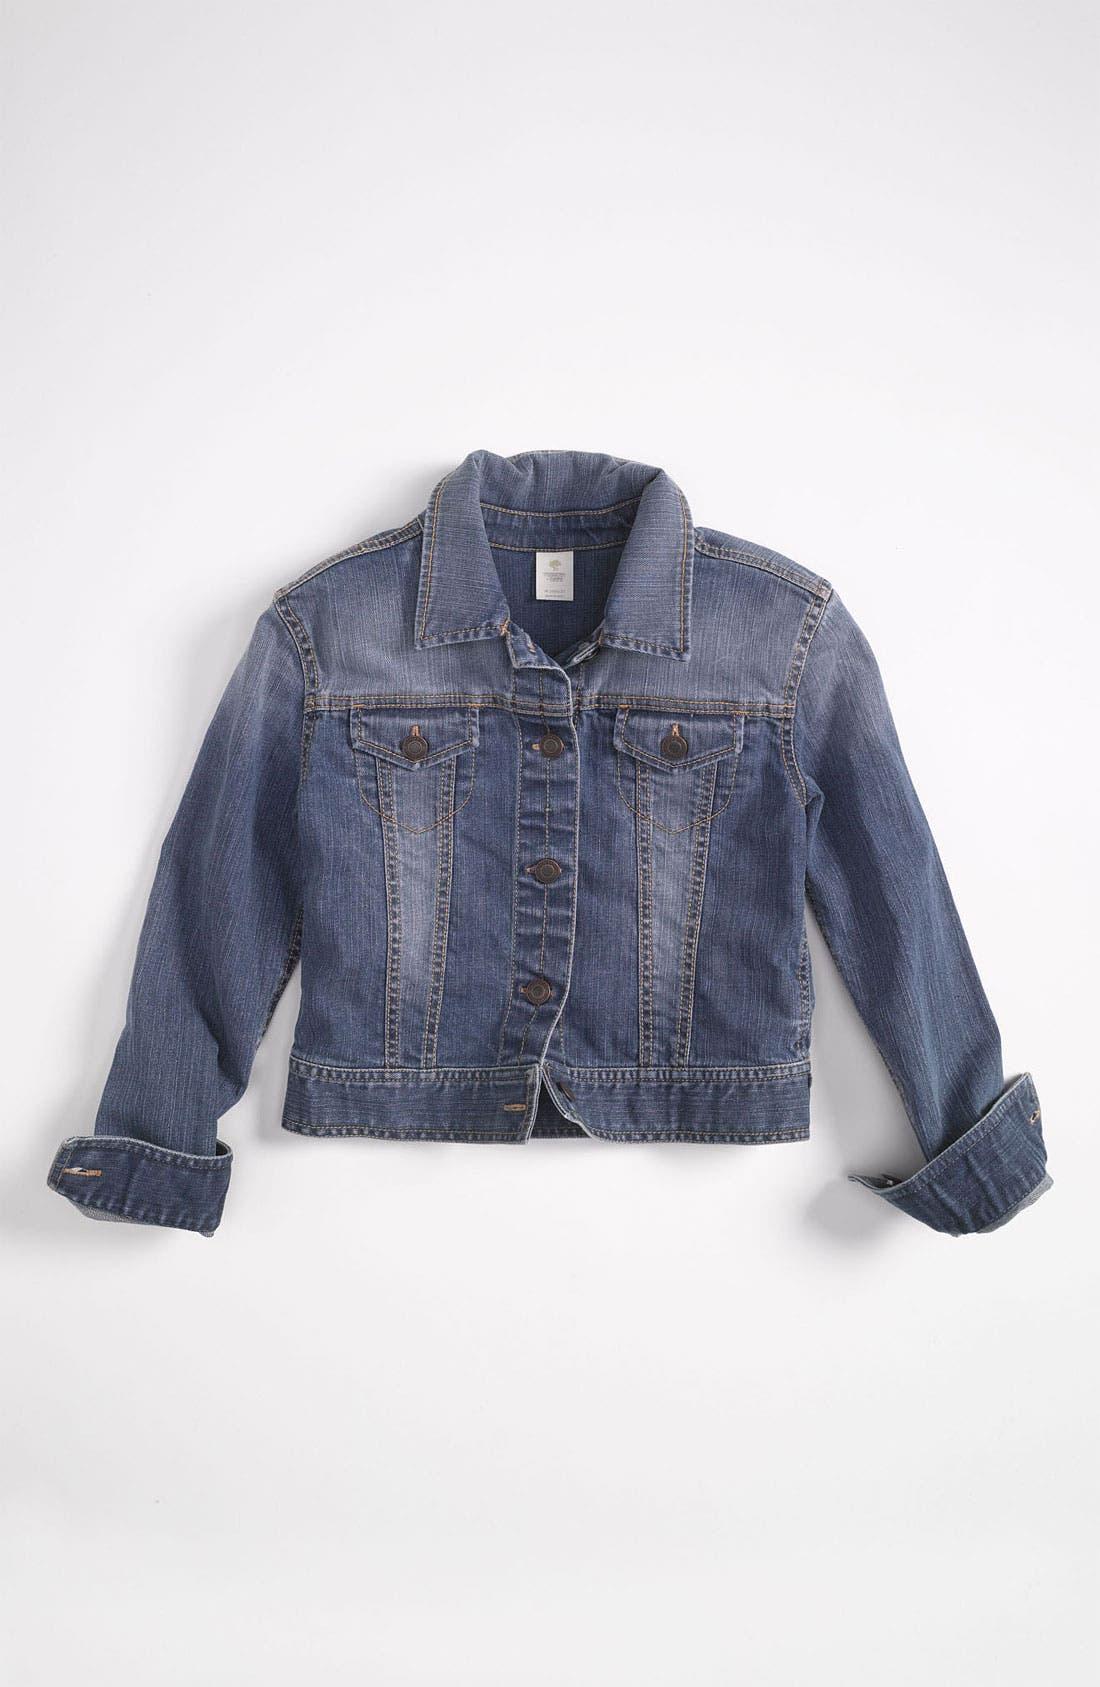 Alternate Image 1 Selected - Tucker + Tate Denim Jacket (Toddler)